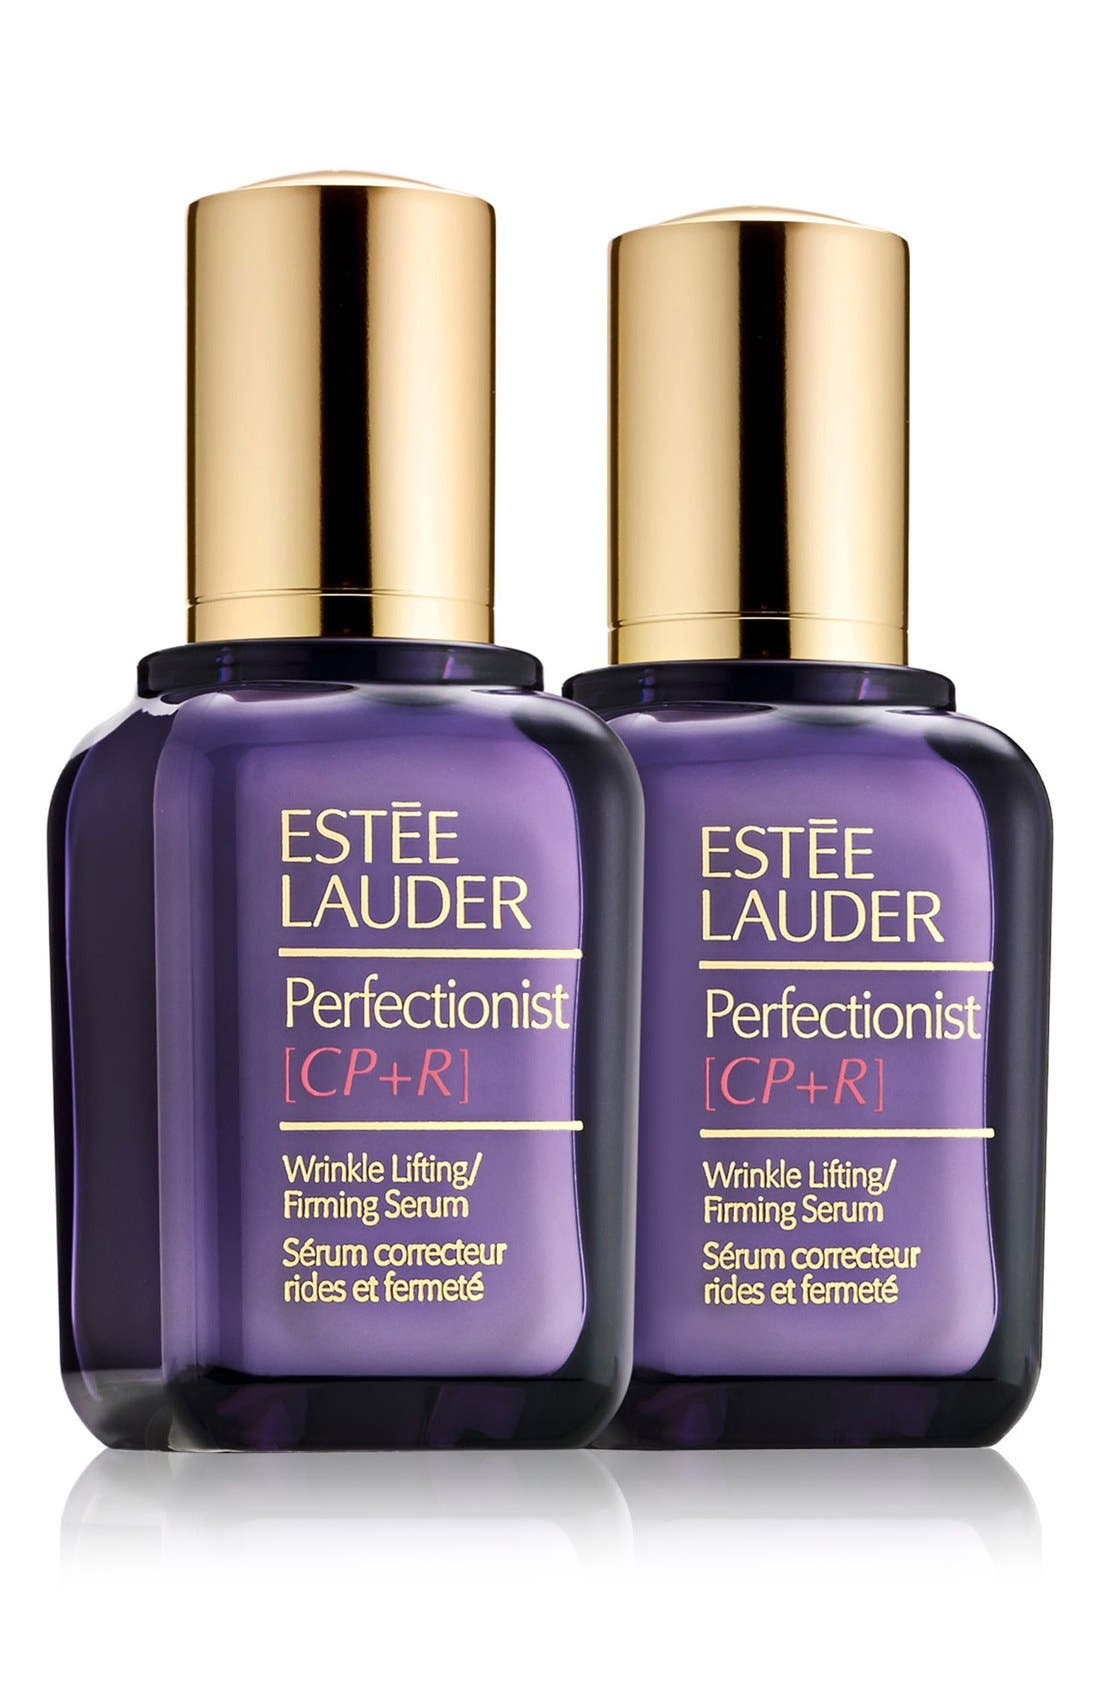 ESTÉE LAUDER, Perfectionist [CP+R] Wrinkle Lifting/Firming Serum Duo, Main thumbnail 1, color, NO COLOR